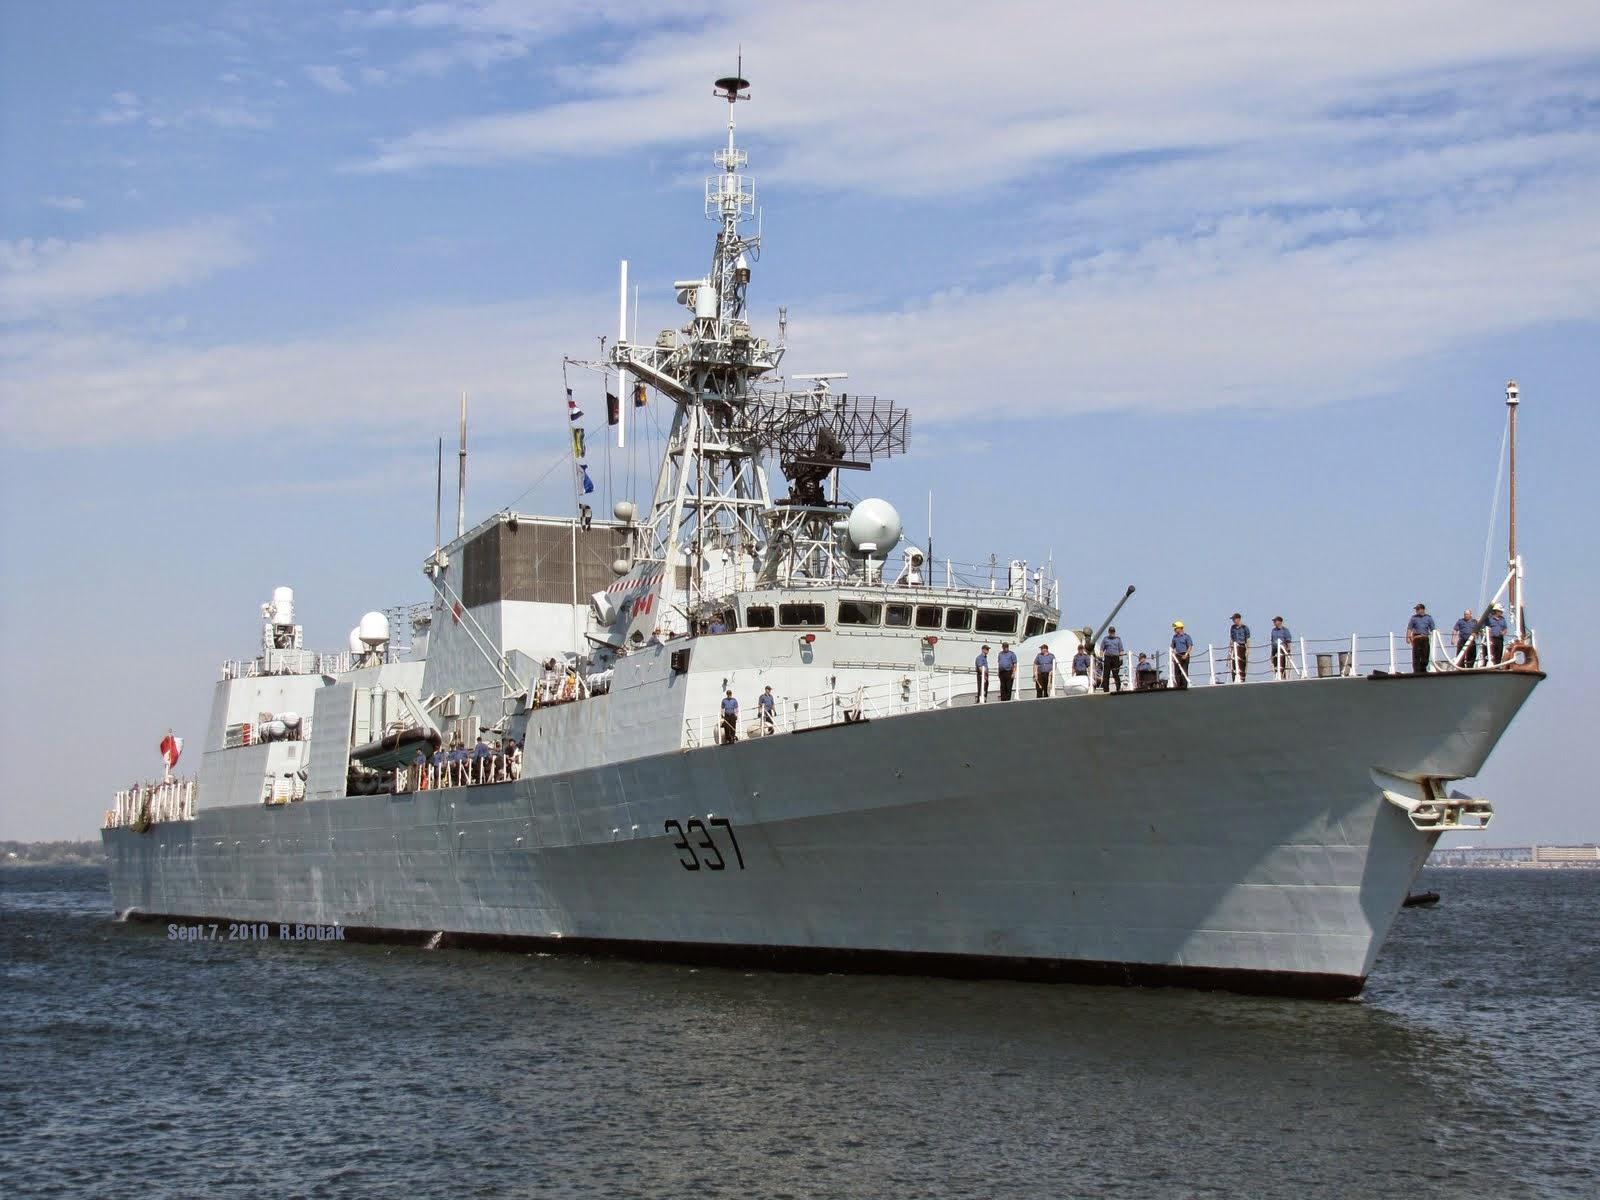 Fregat Kanada akan bergabung pasukan NATO di Ukraina